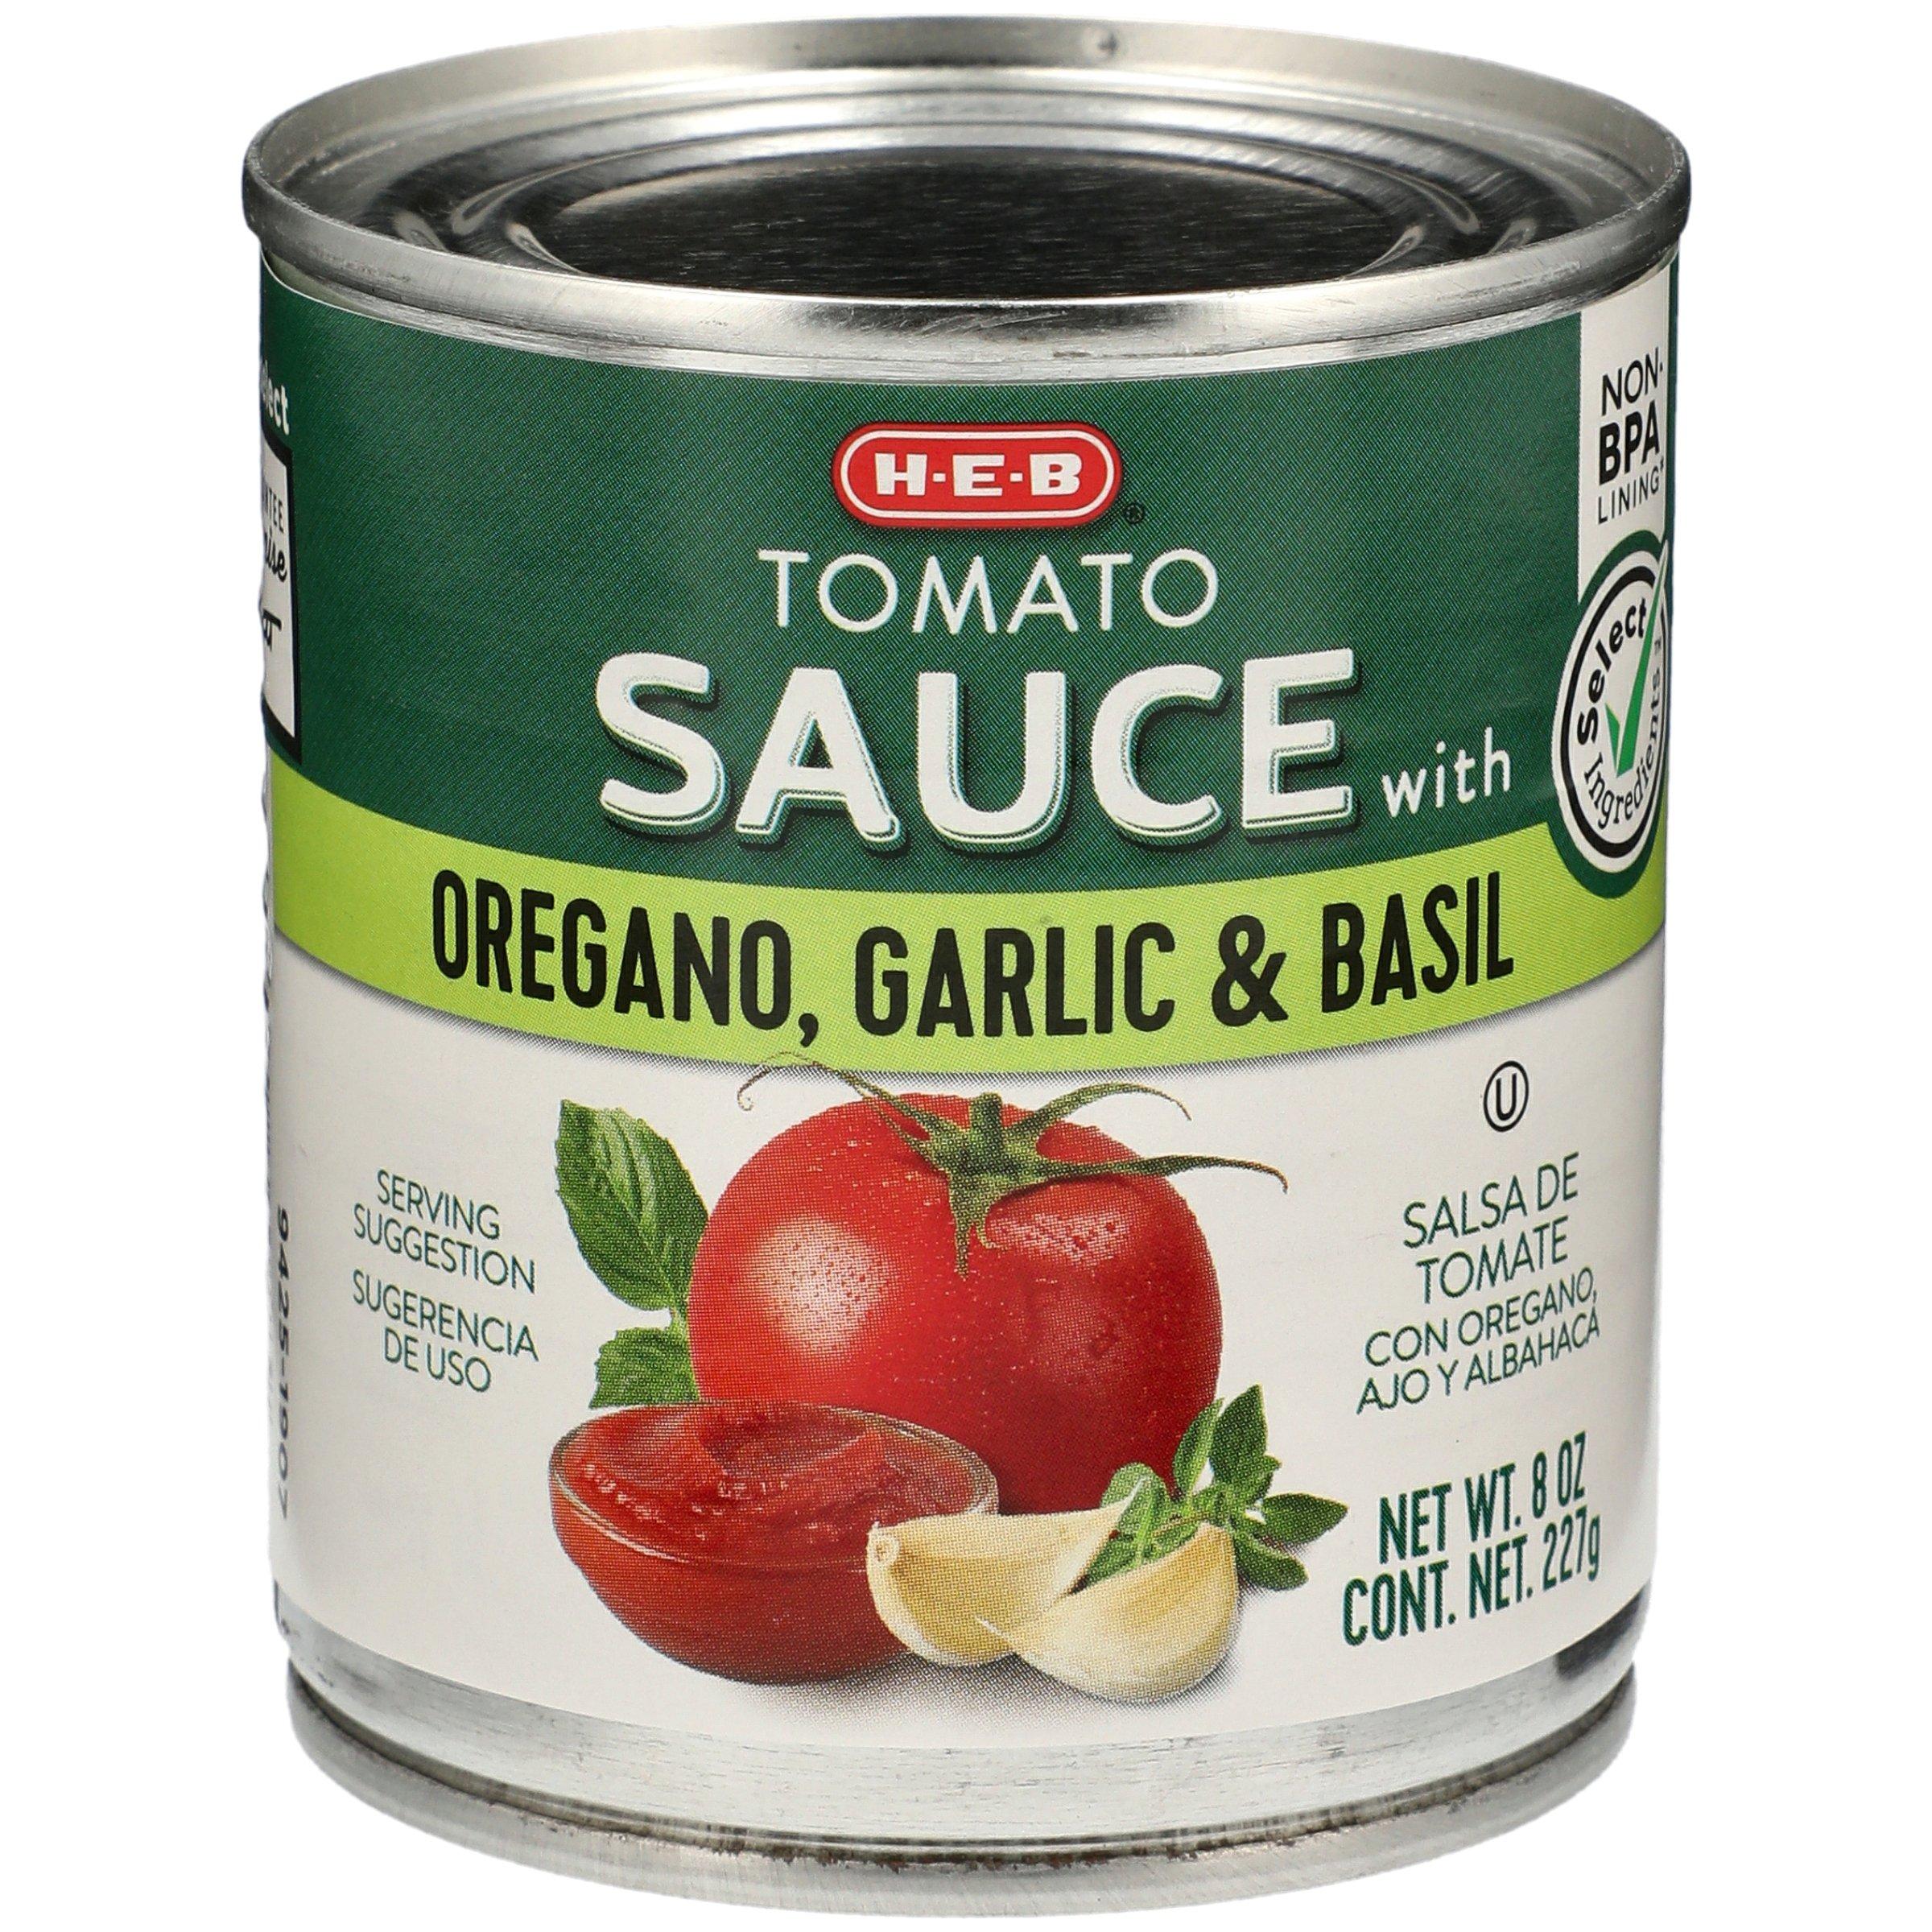 H‑E‑B Select Ingredients Tomato Sauce with Oregano Garlic and Basil ...